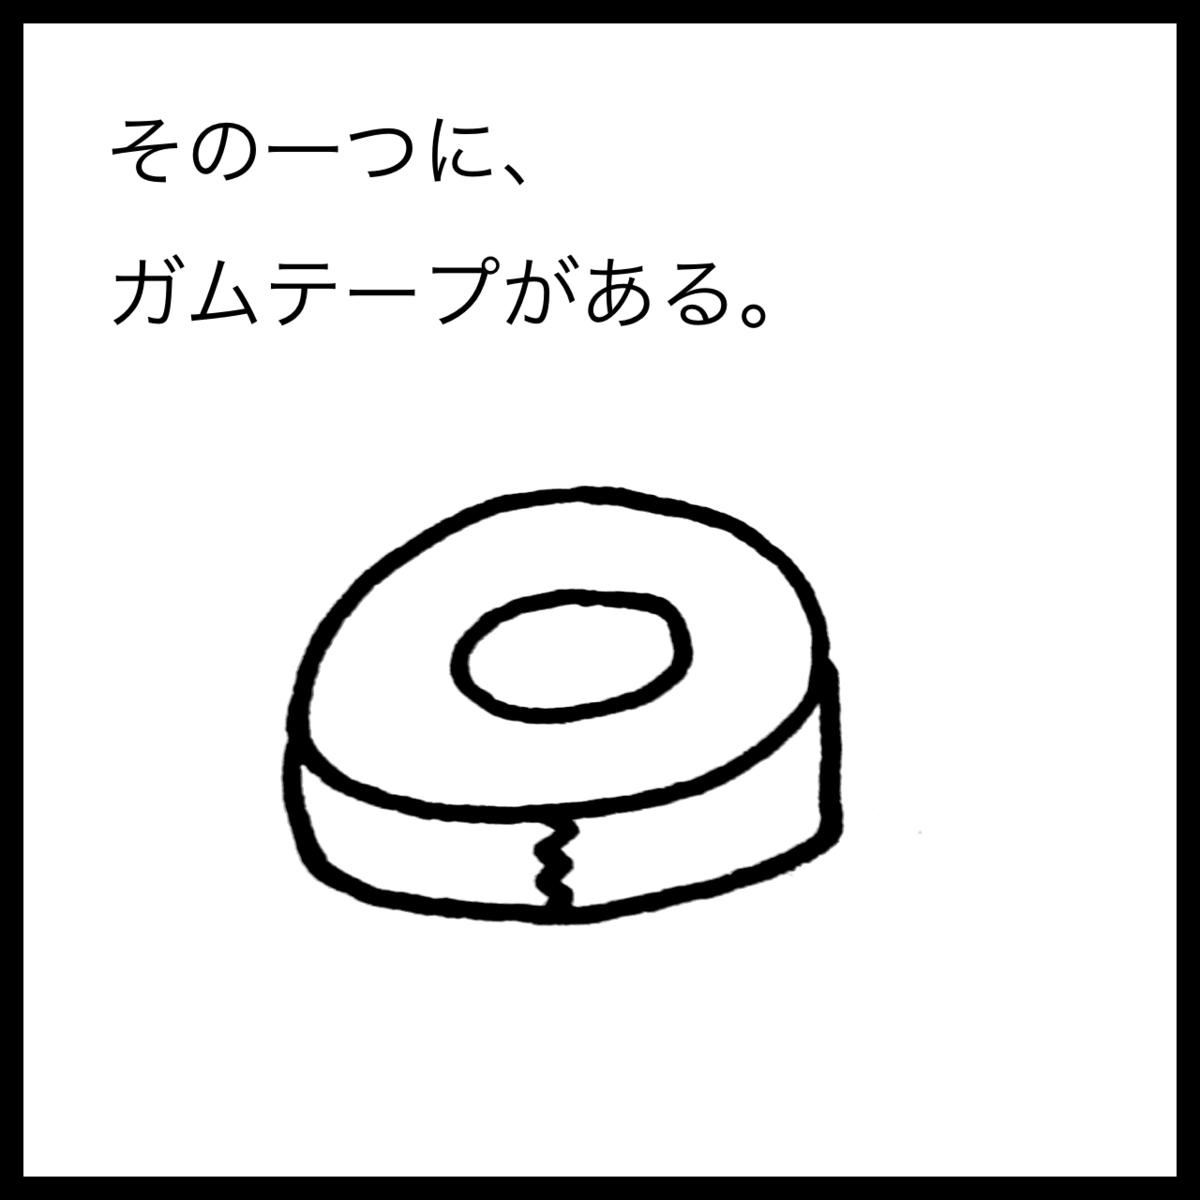 f:id:komyusyomama:20210726213616p:plain